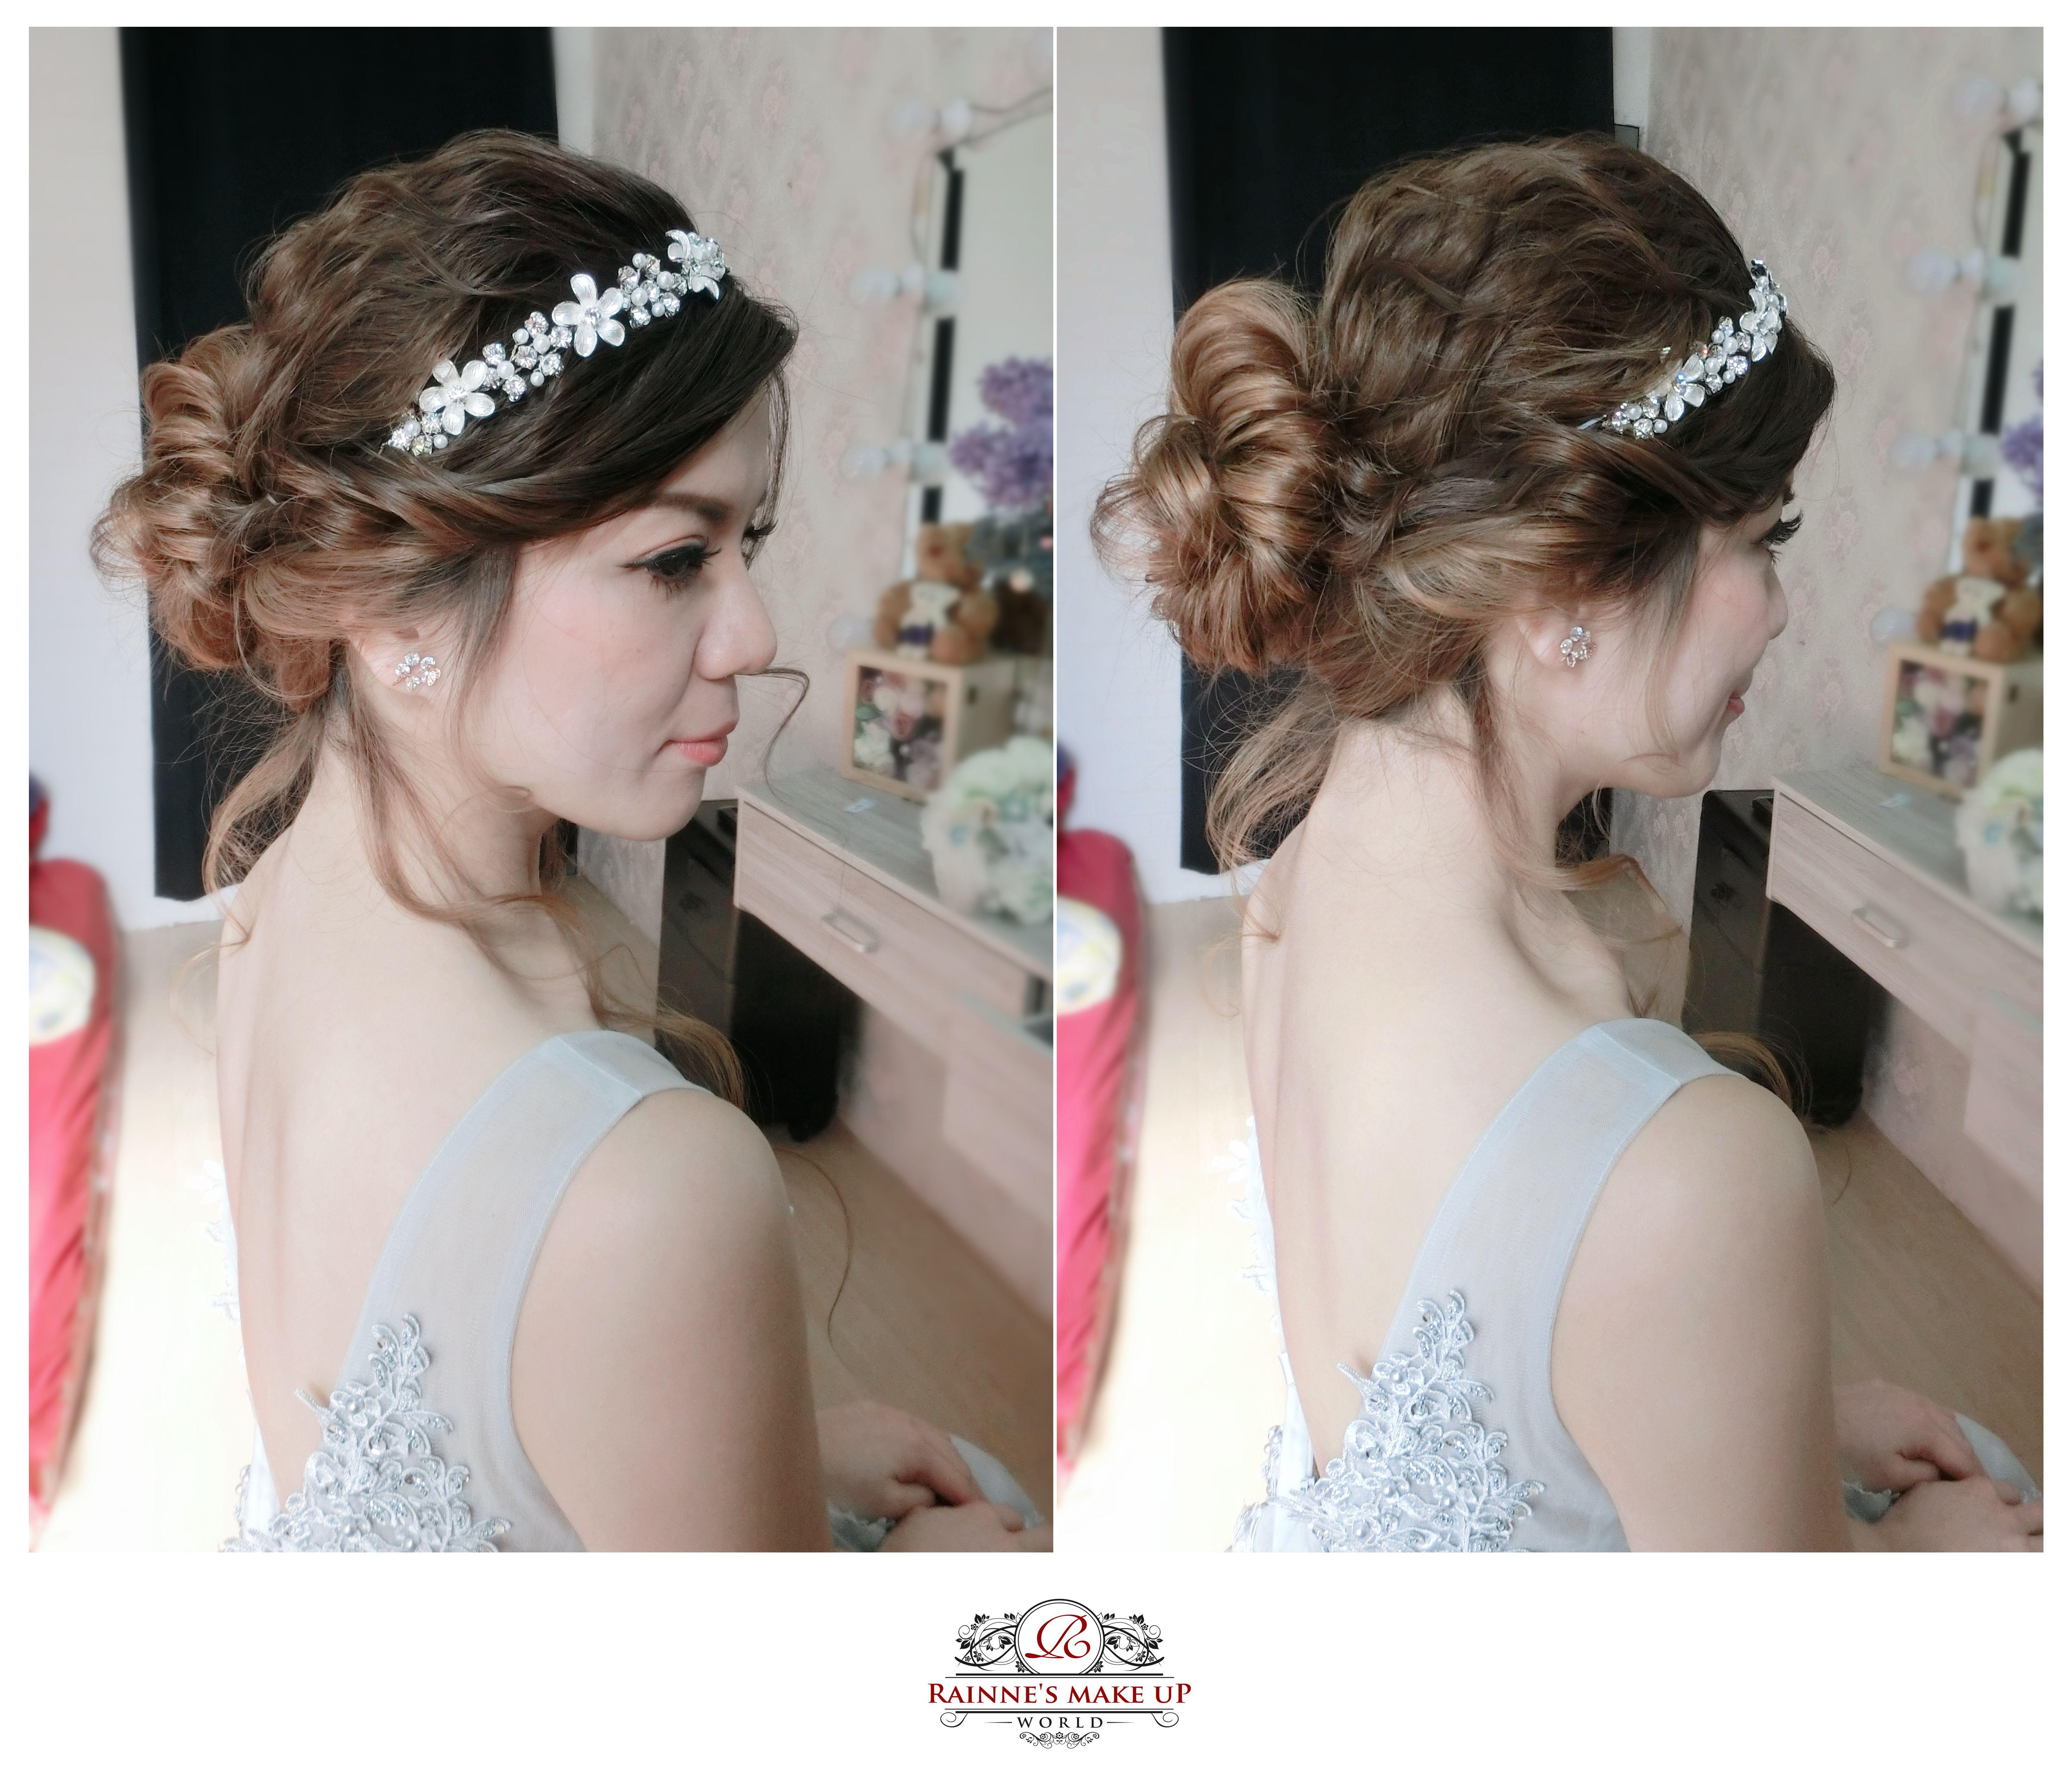 Wedding Hairstyle Near Me: Rainne Makeup World,rainneyap,bridal Makeup, Wedding